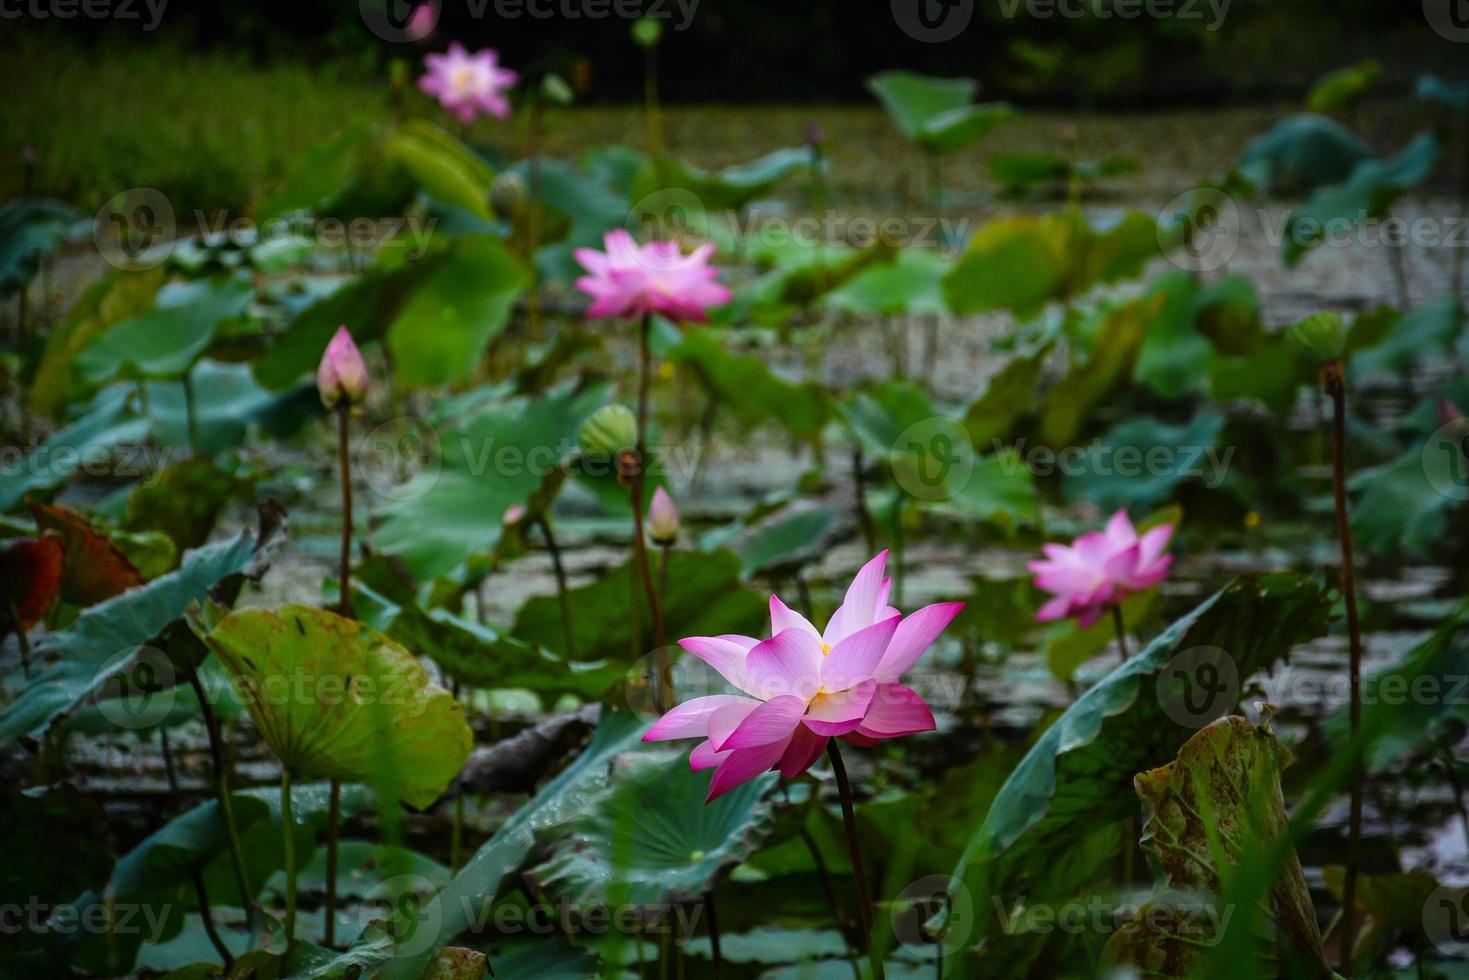 Étang de lotus dans le parc national de Krating Waterfall Iat Chantaburi, Thaïlande photo